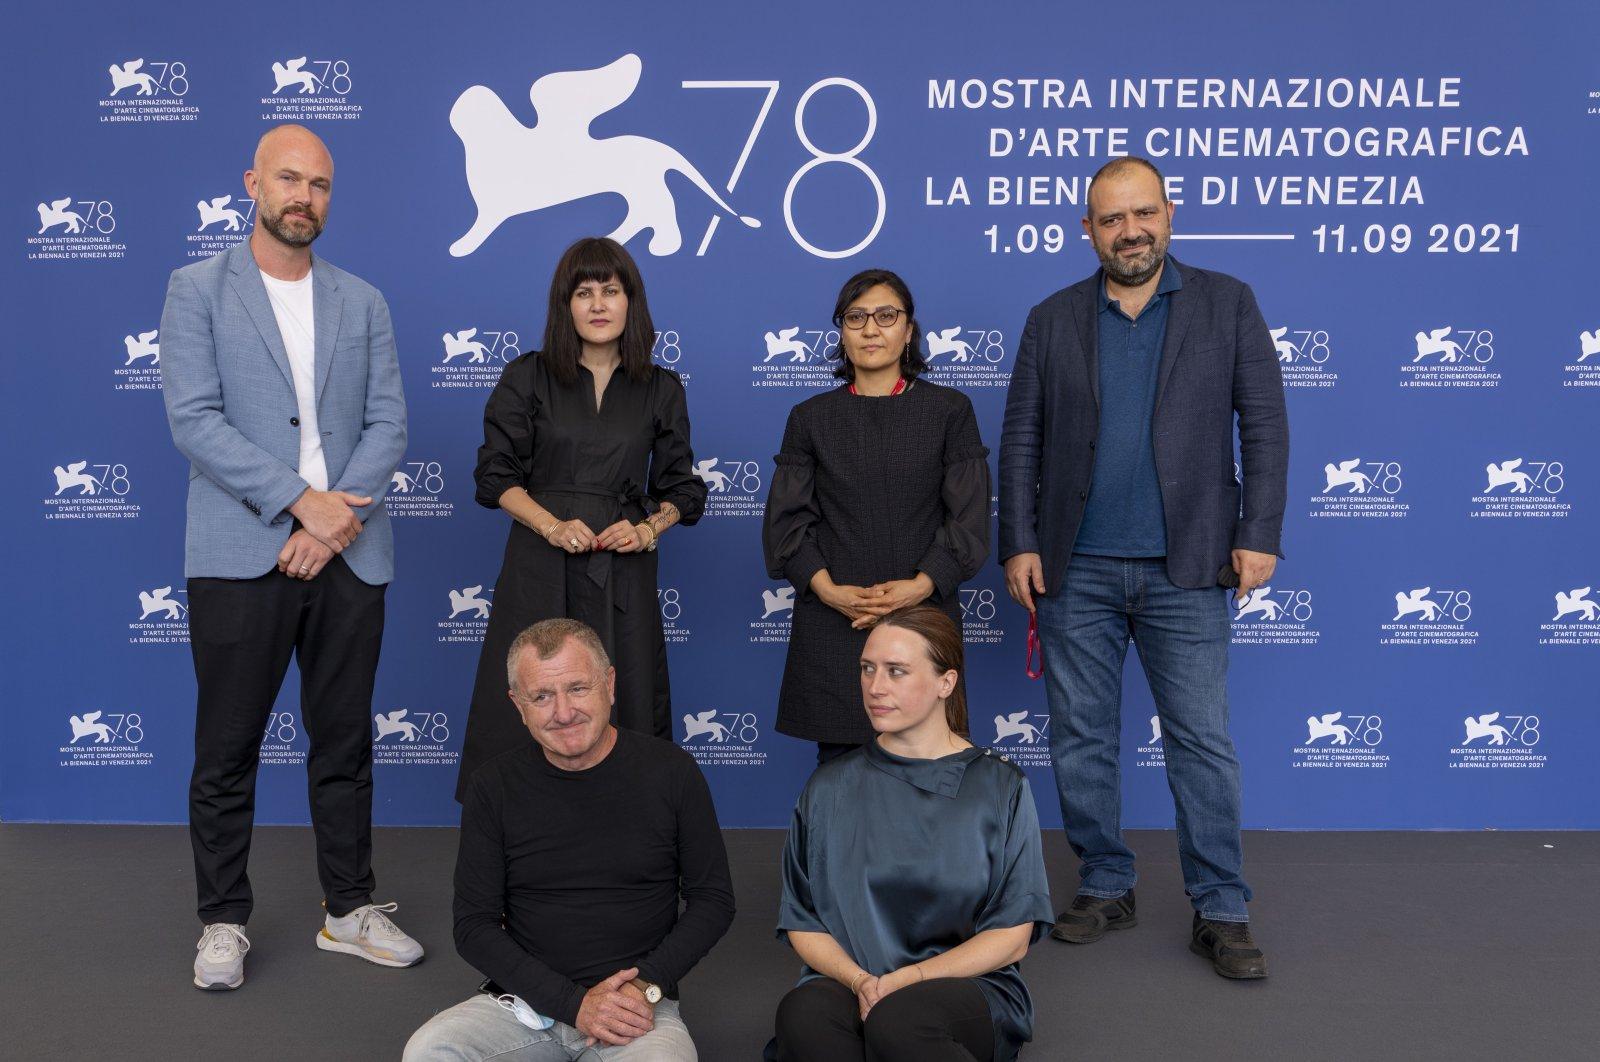 (L-R) Matthijs Wouter Knol, Sahraa Karimi, Sarah Mani, Orwa Nyrabia, Vanja Kaludjercic and Mike Downey pose during the Venice Film Festival, in Venice, Italy, Sept. 4, 2021. (AP Photo)